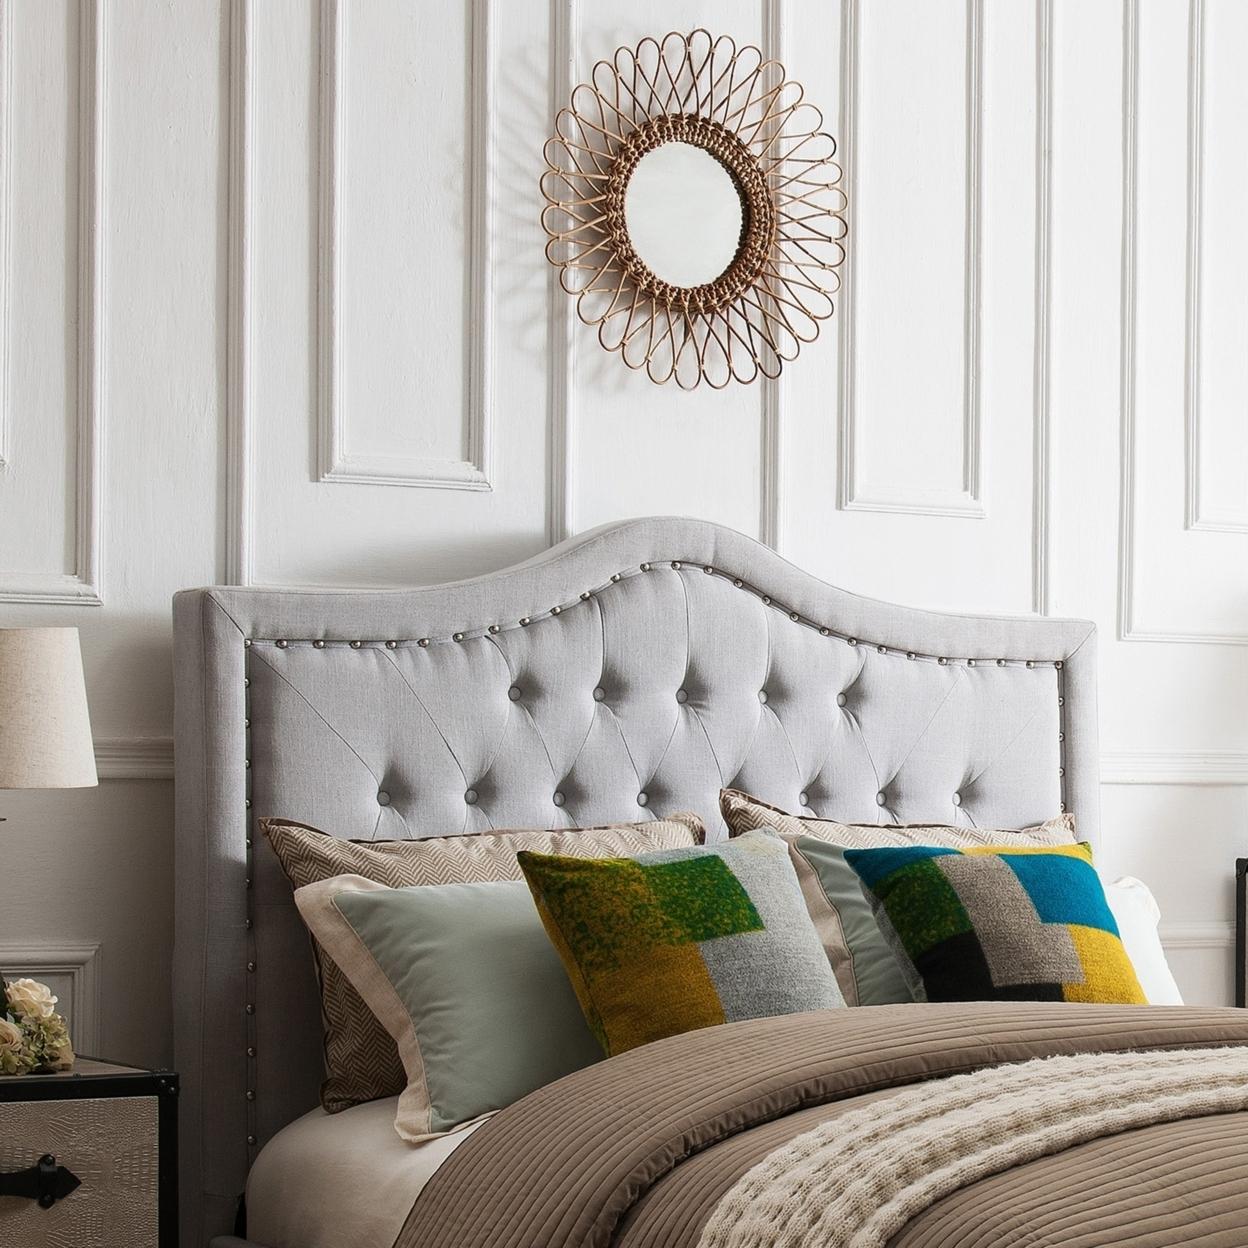 Denise Austin Home Ronan King/cal King Upholstered Tufted Fabric Headboard